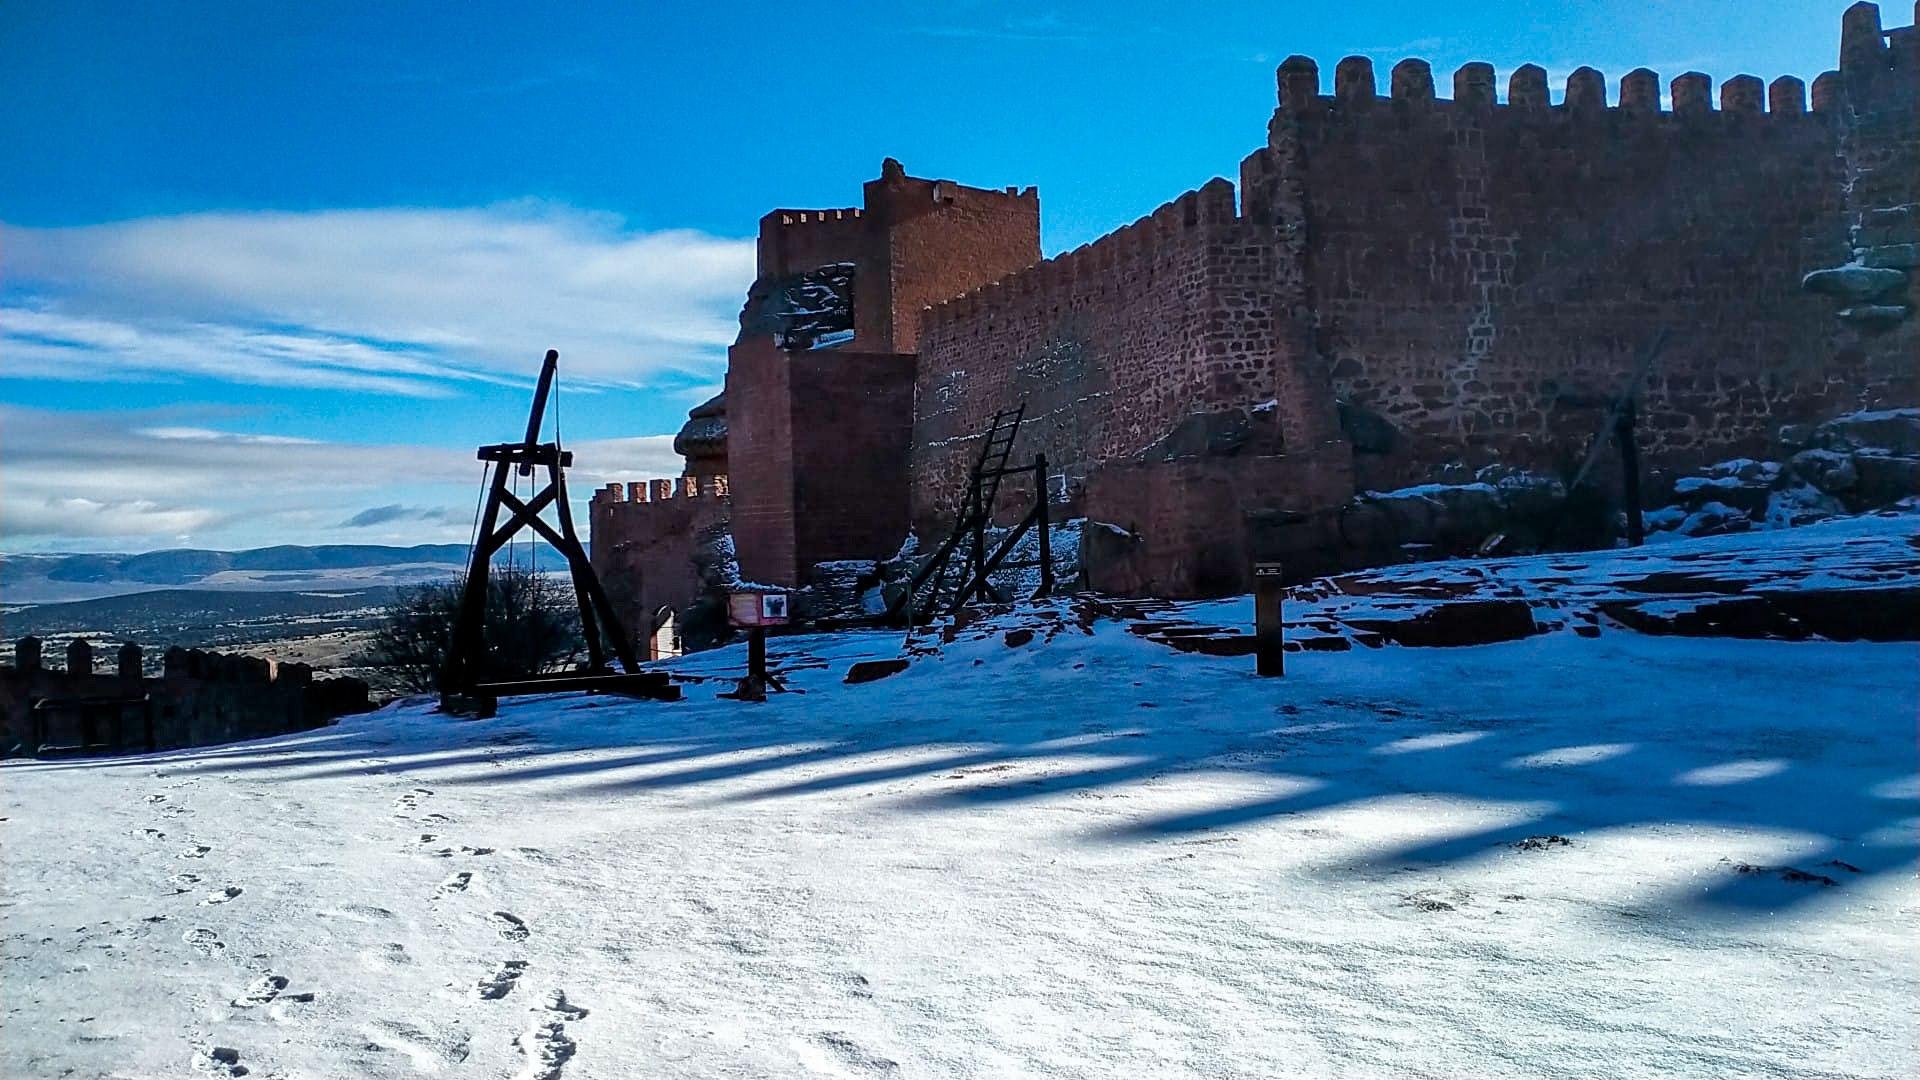 castillo-peracense-nevado